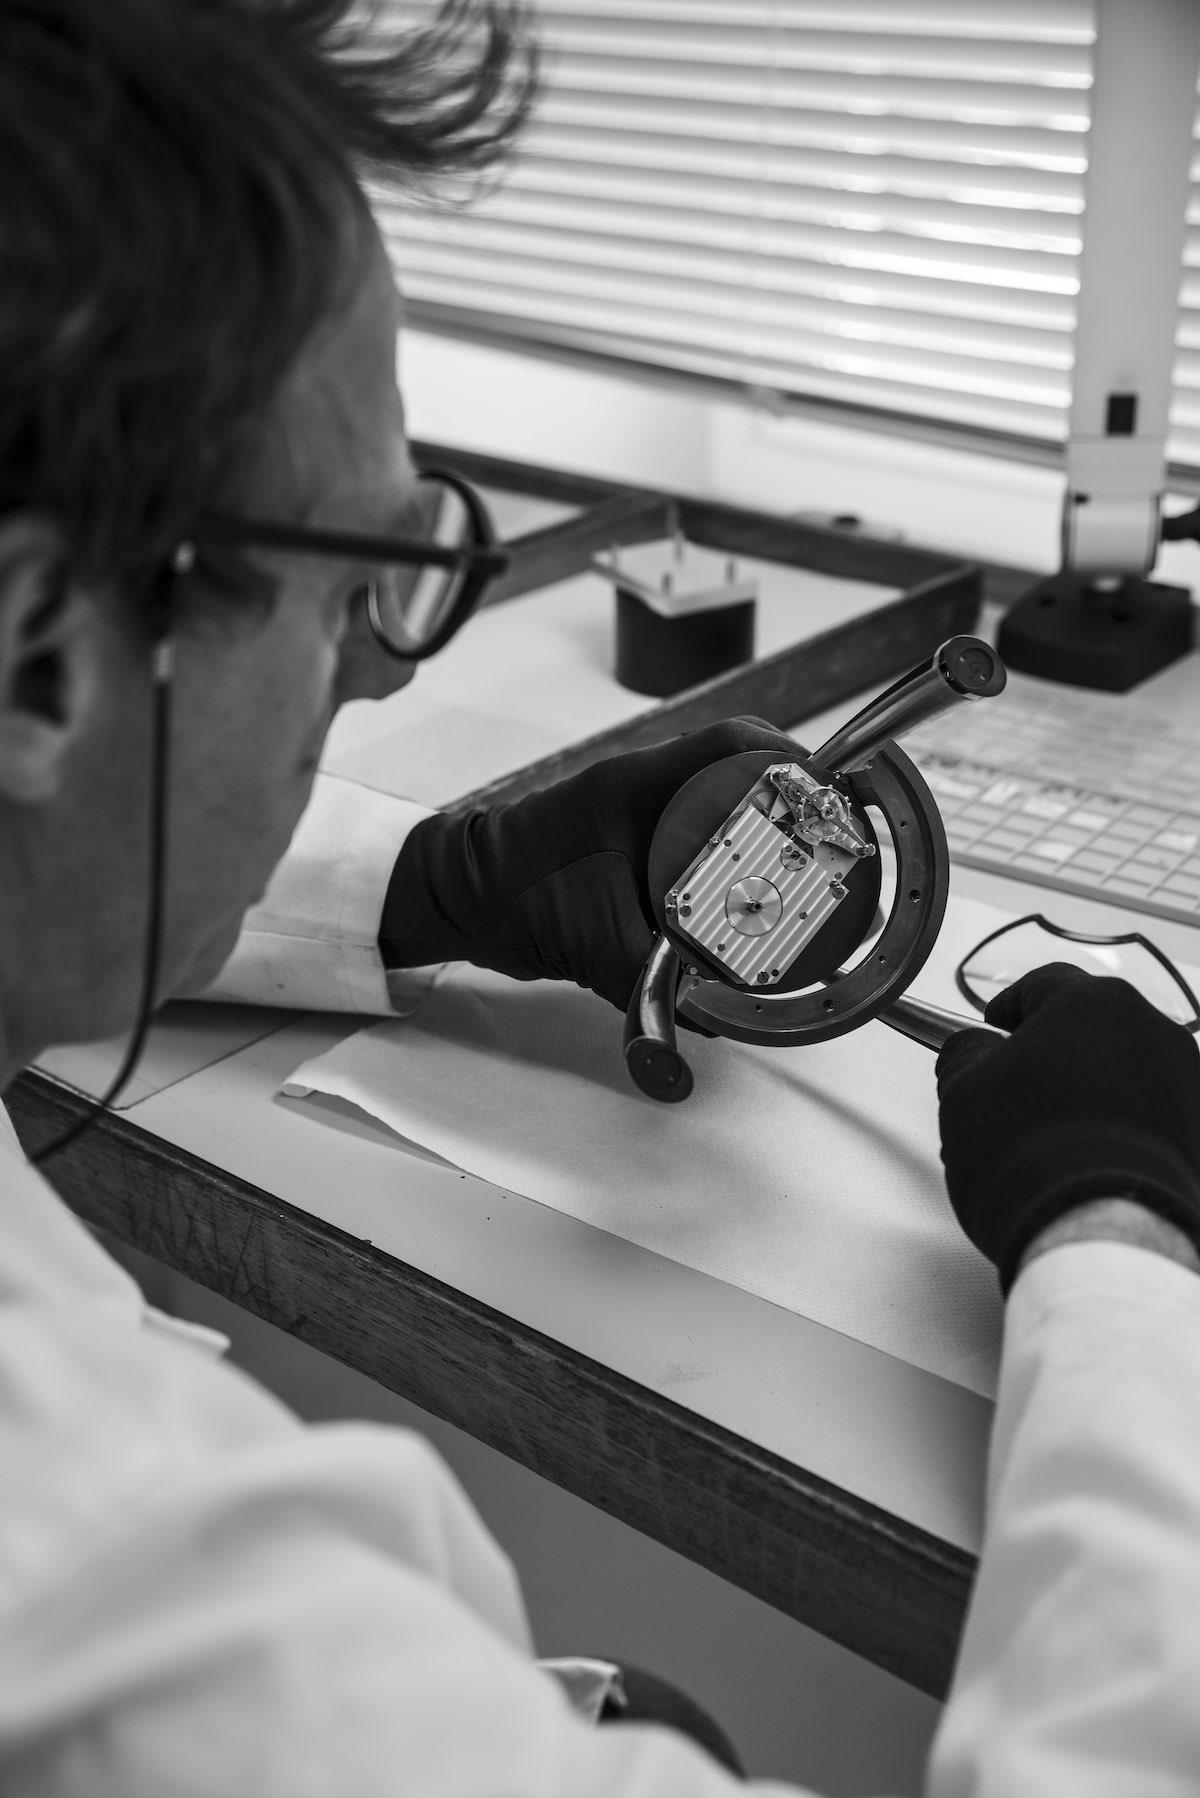 De Bethune Dream Watch 6 Table Clock x byJorgHysek - 7